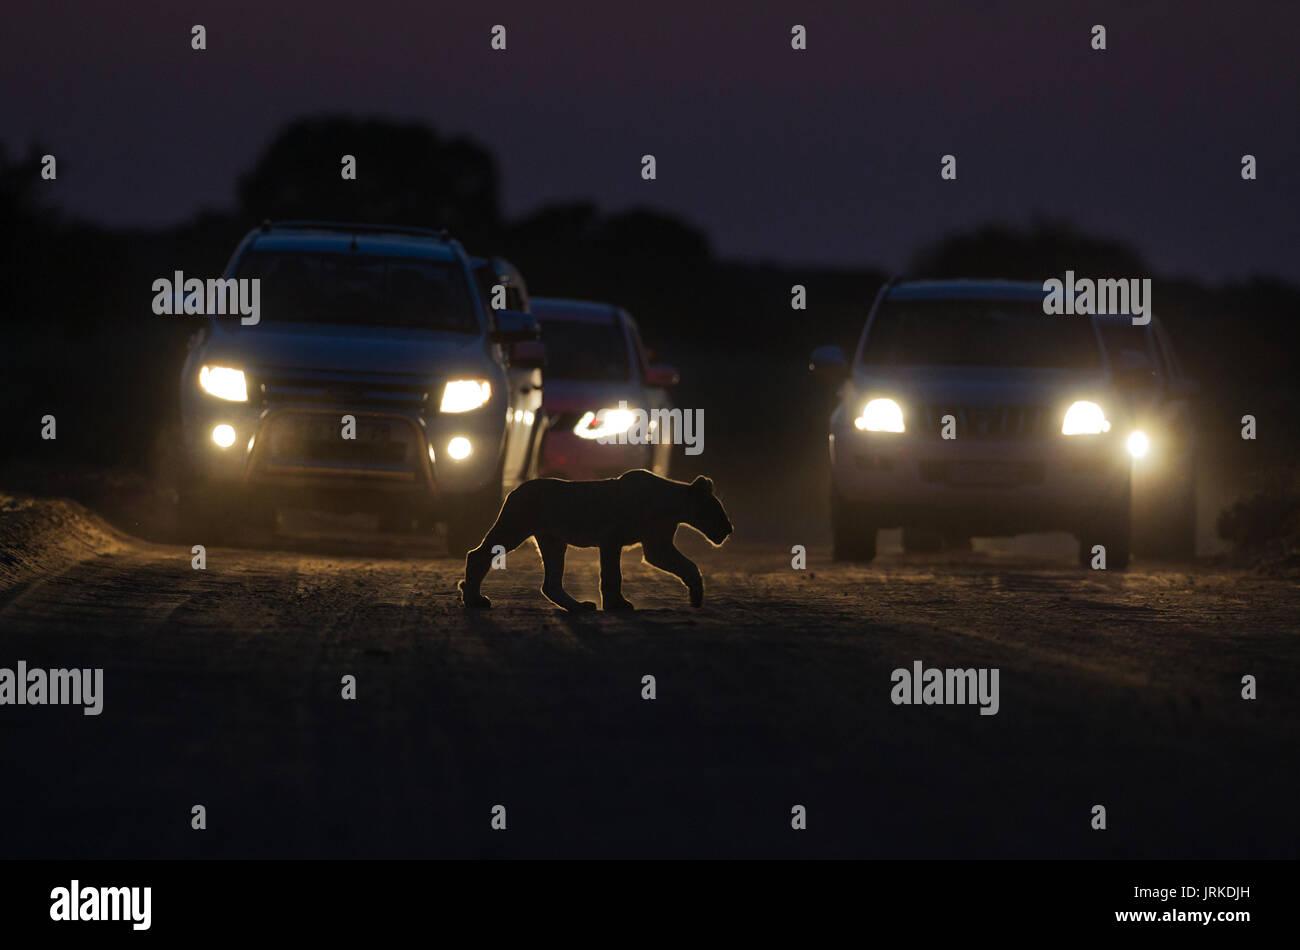 Lion (Panthera leo), cub crosses a road at night, cars behind for morning game drive, Kalahari Desert - Stock Image